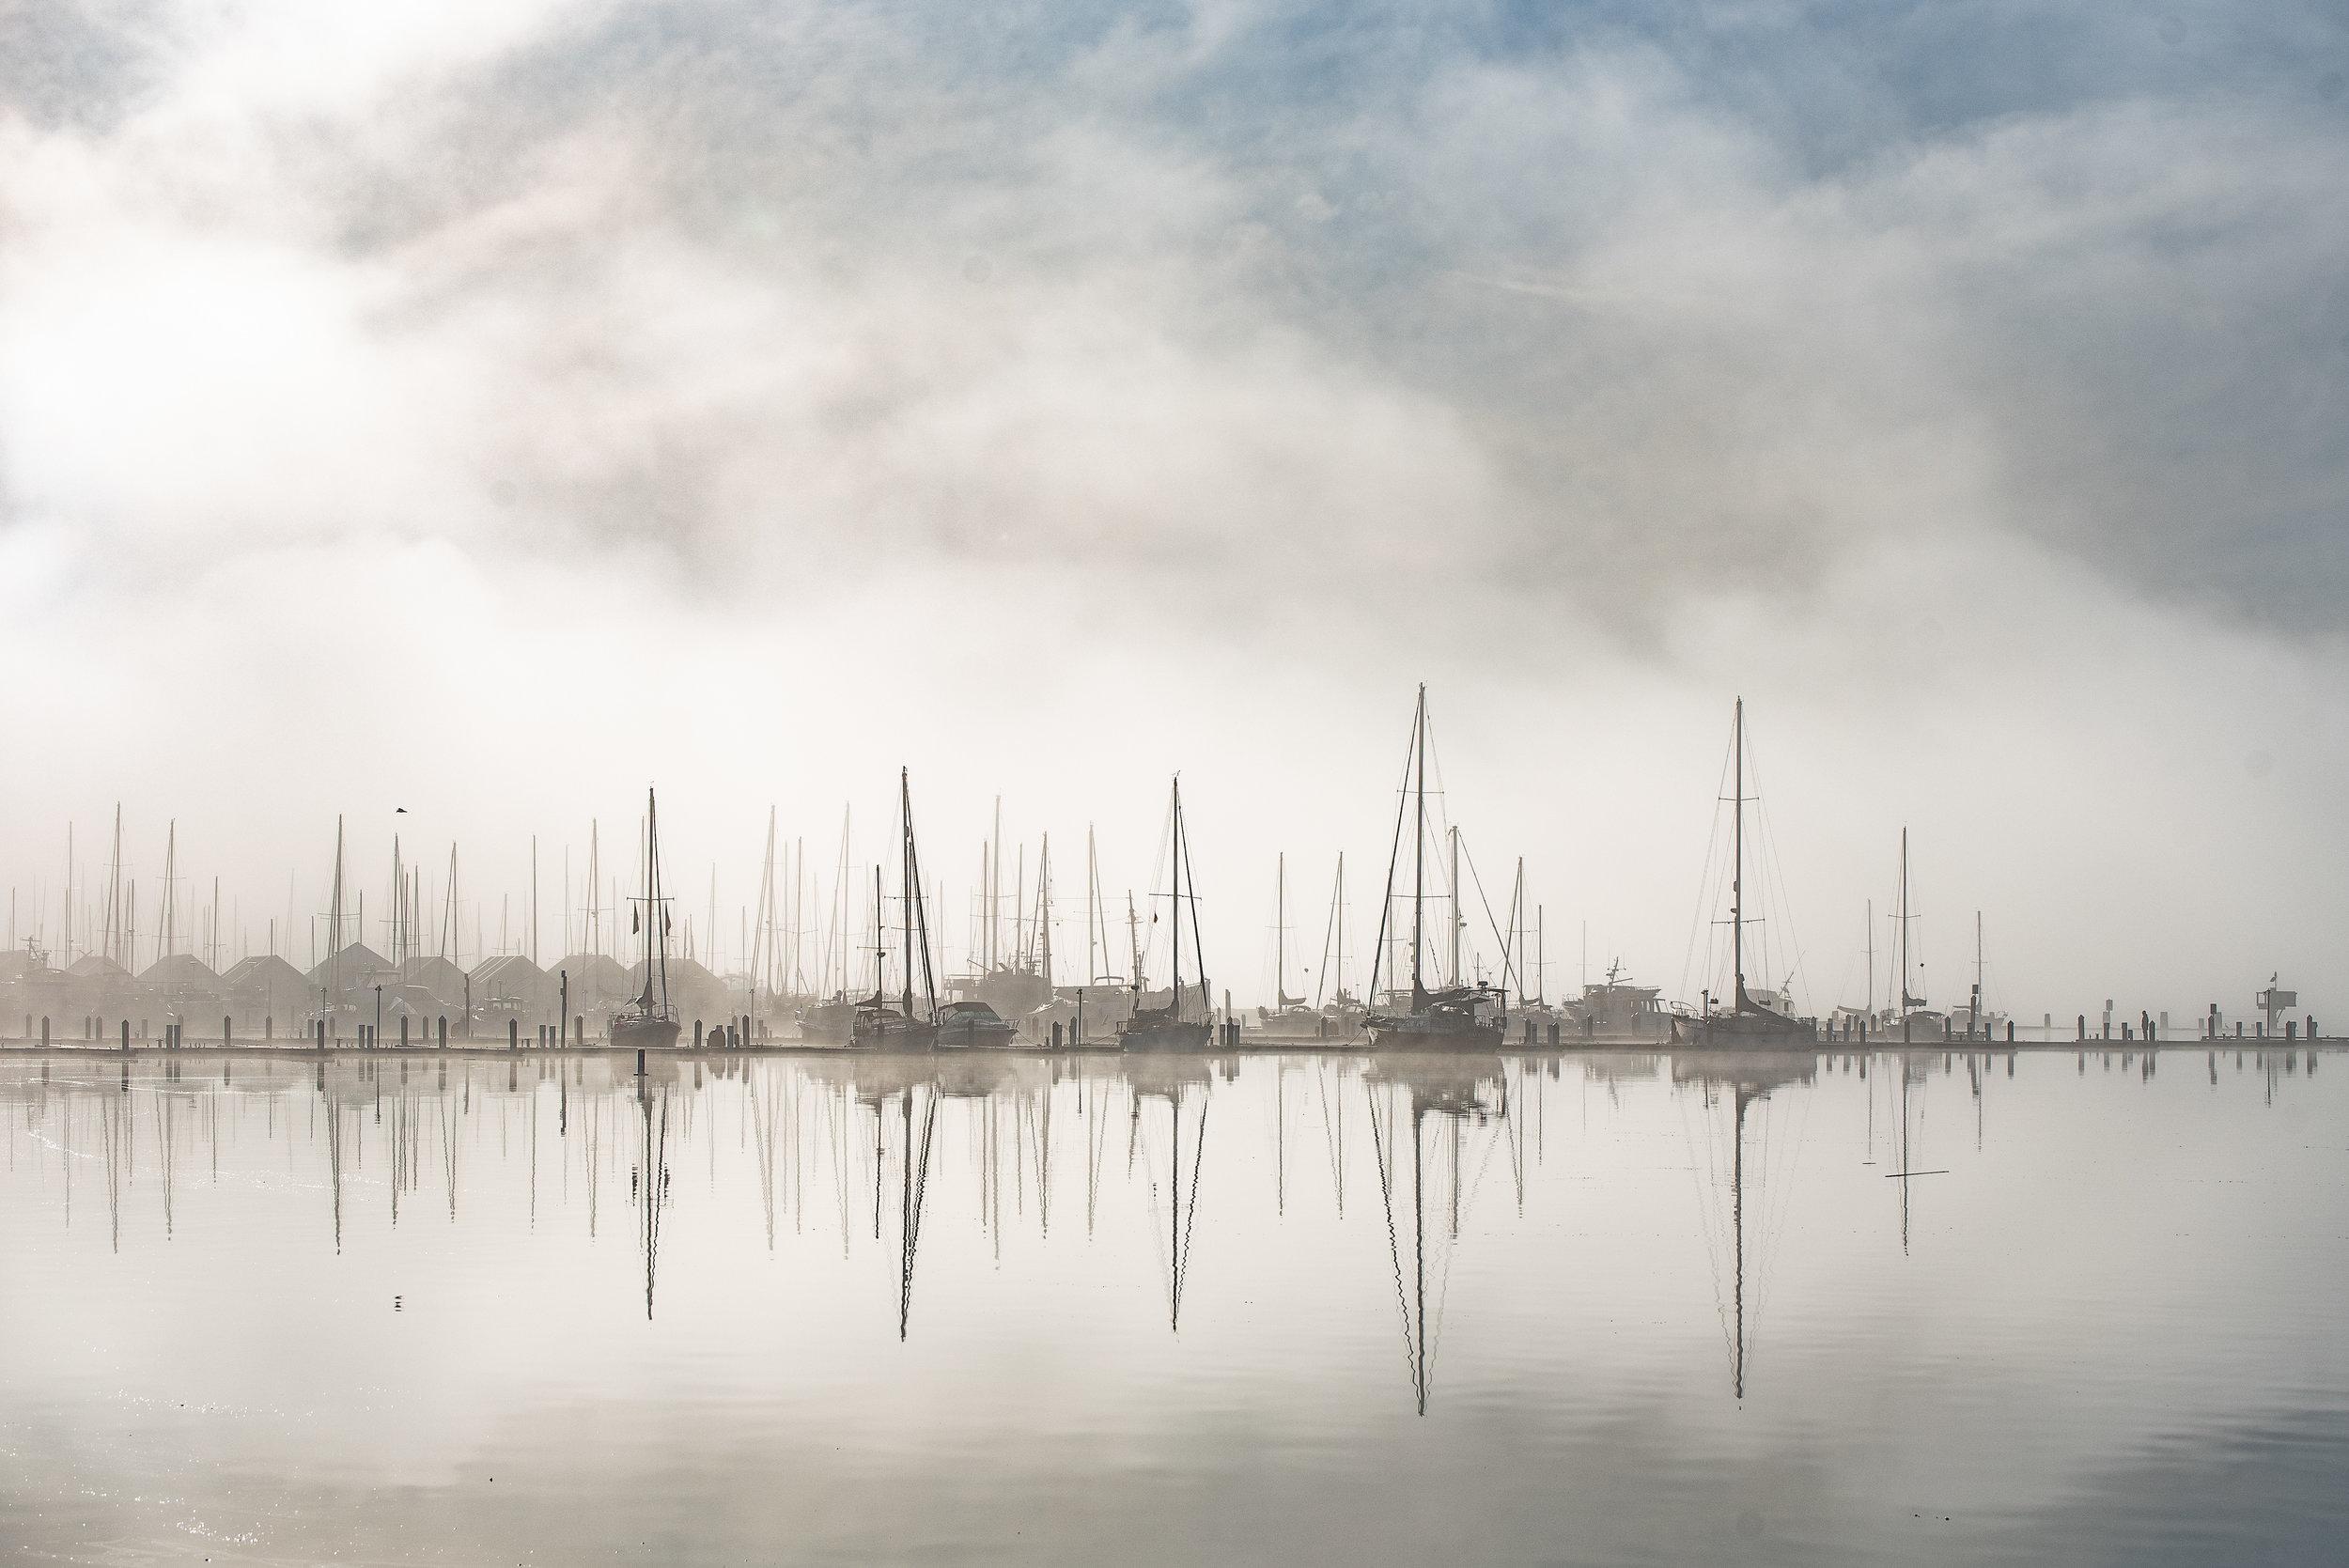 Morning fog over Liberty Bay